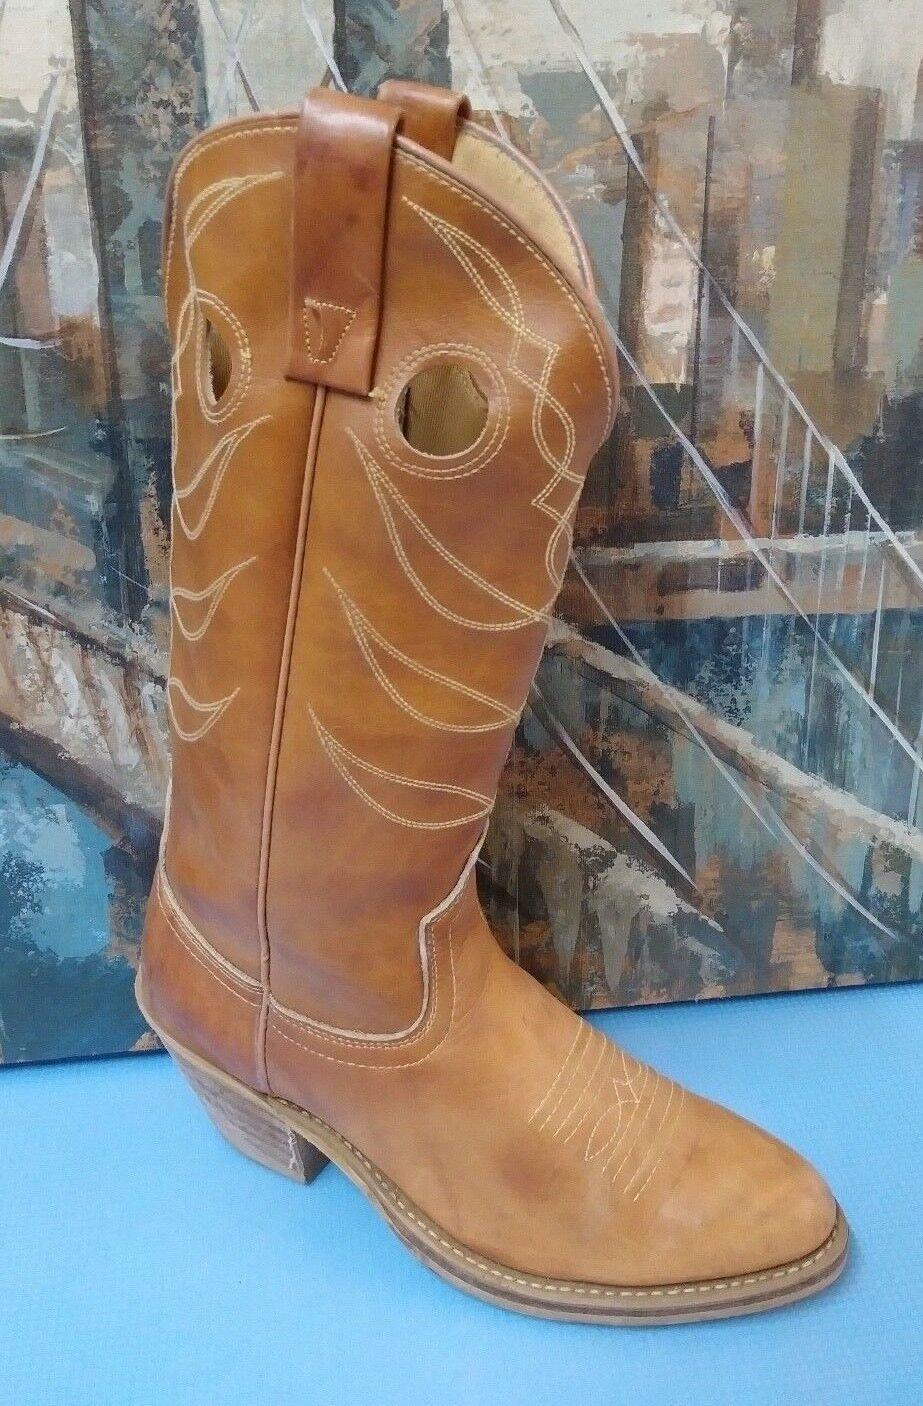 Acme Western 4607 Cowboy Stiefel Größe 6.5 B Damenschuhe